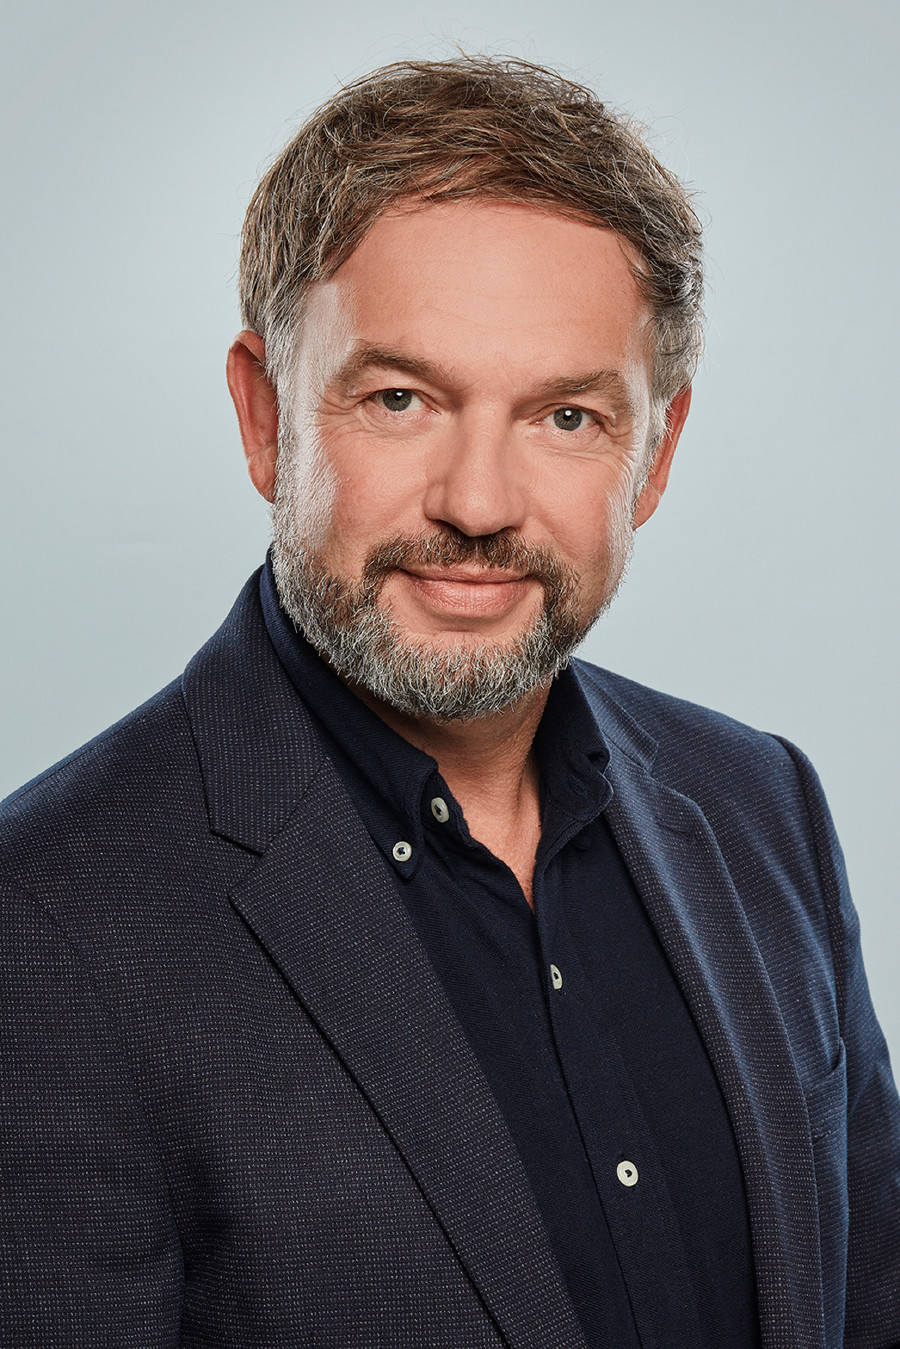 Abteilungsleiter Dr. Martin Kamrat, LL.M. © Florian Stöllinger, AK OÖ